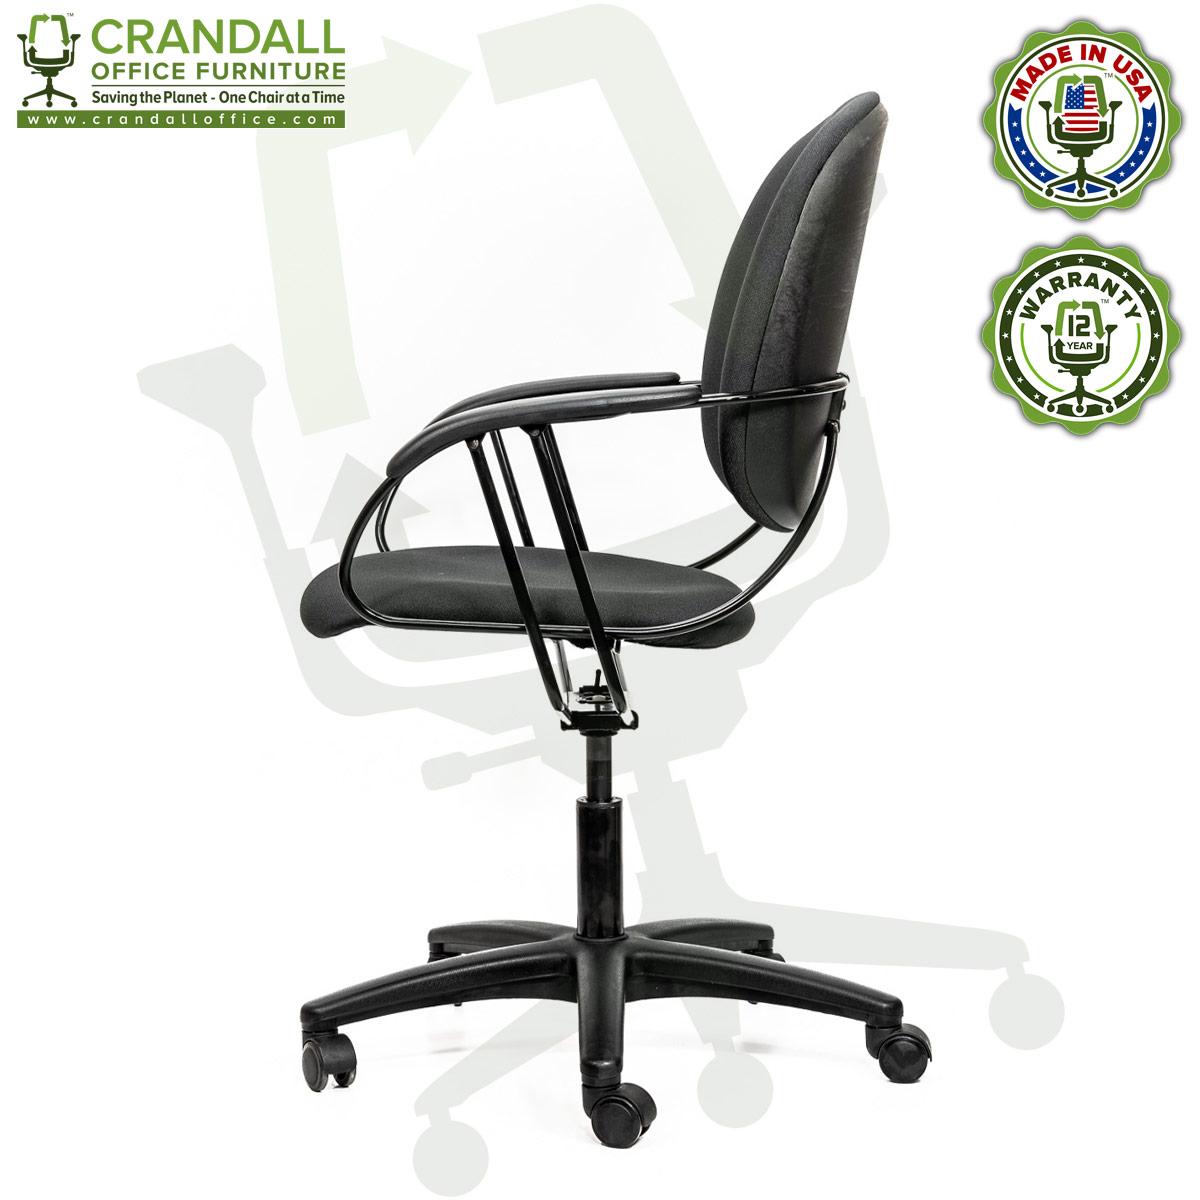 Remanufactured Steelcase Turnstone TS311 Uno Chair - 03